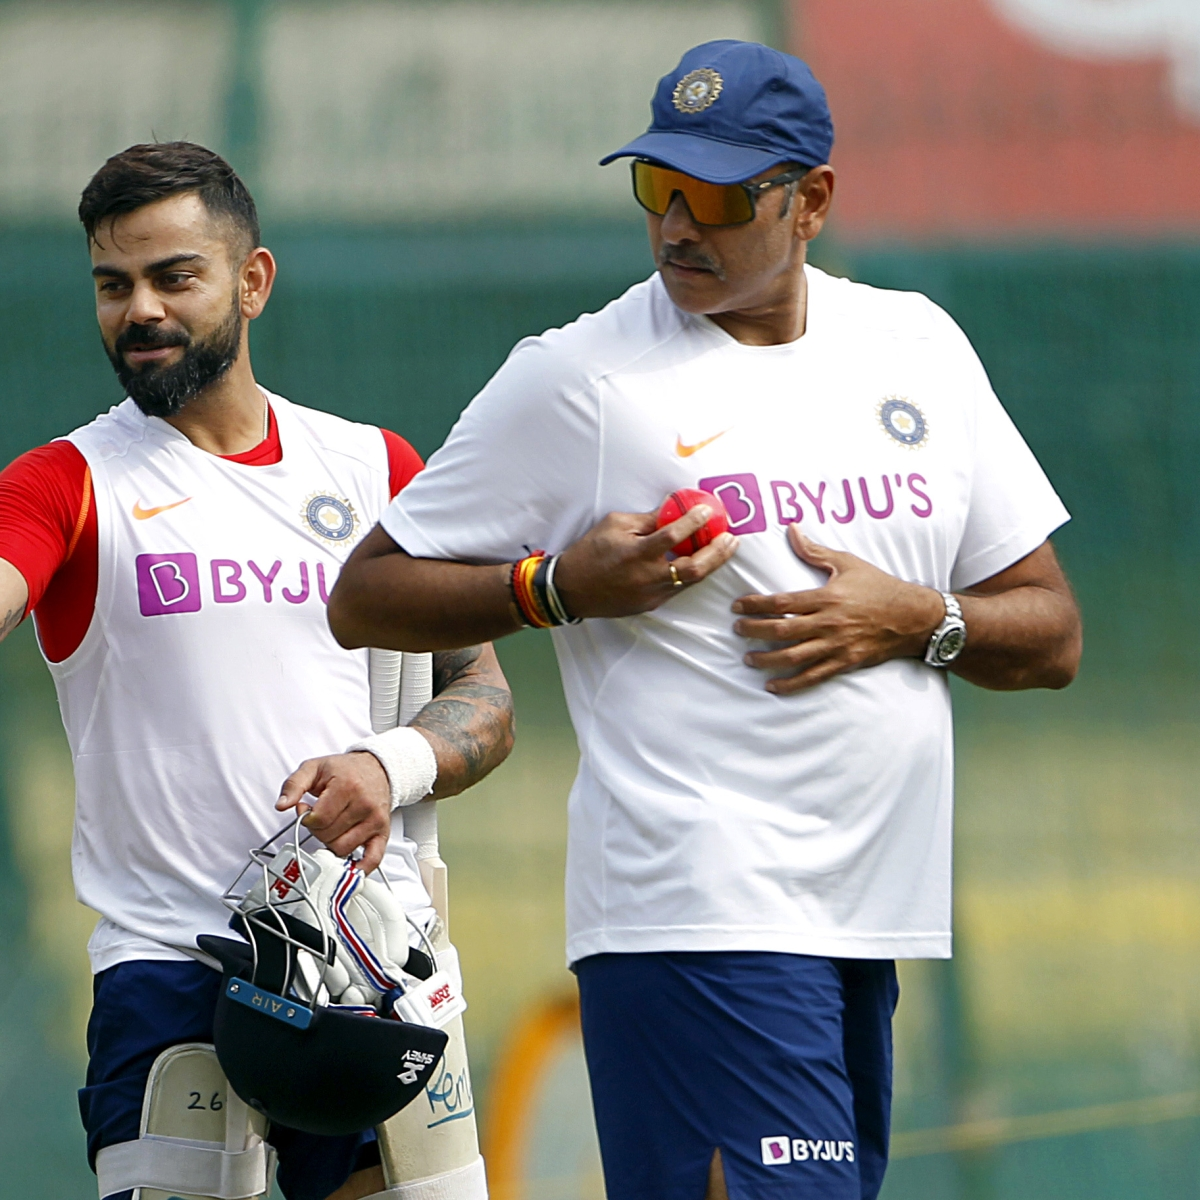 Virat Kohli's captaincy feat vs Australia hard to emulate, says head coach Ravi Shastri